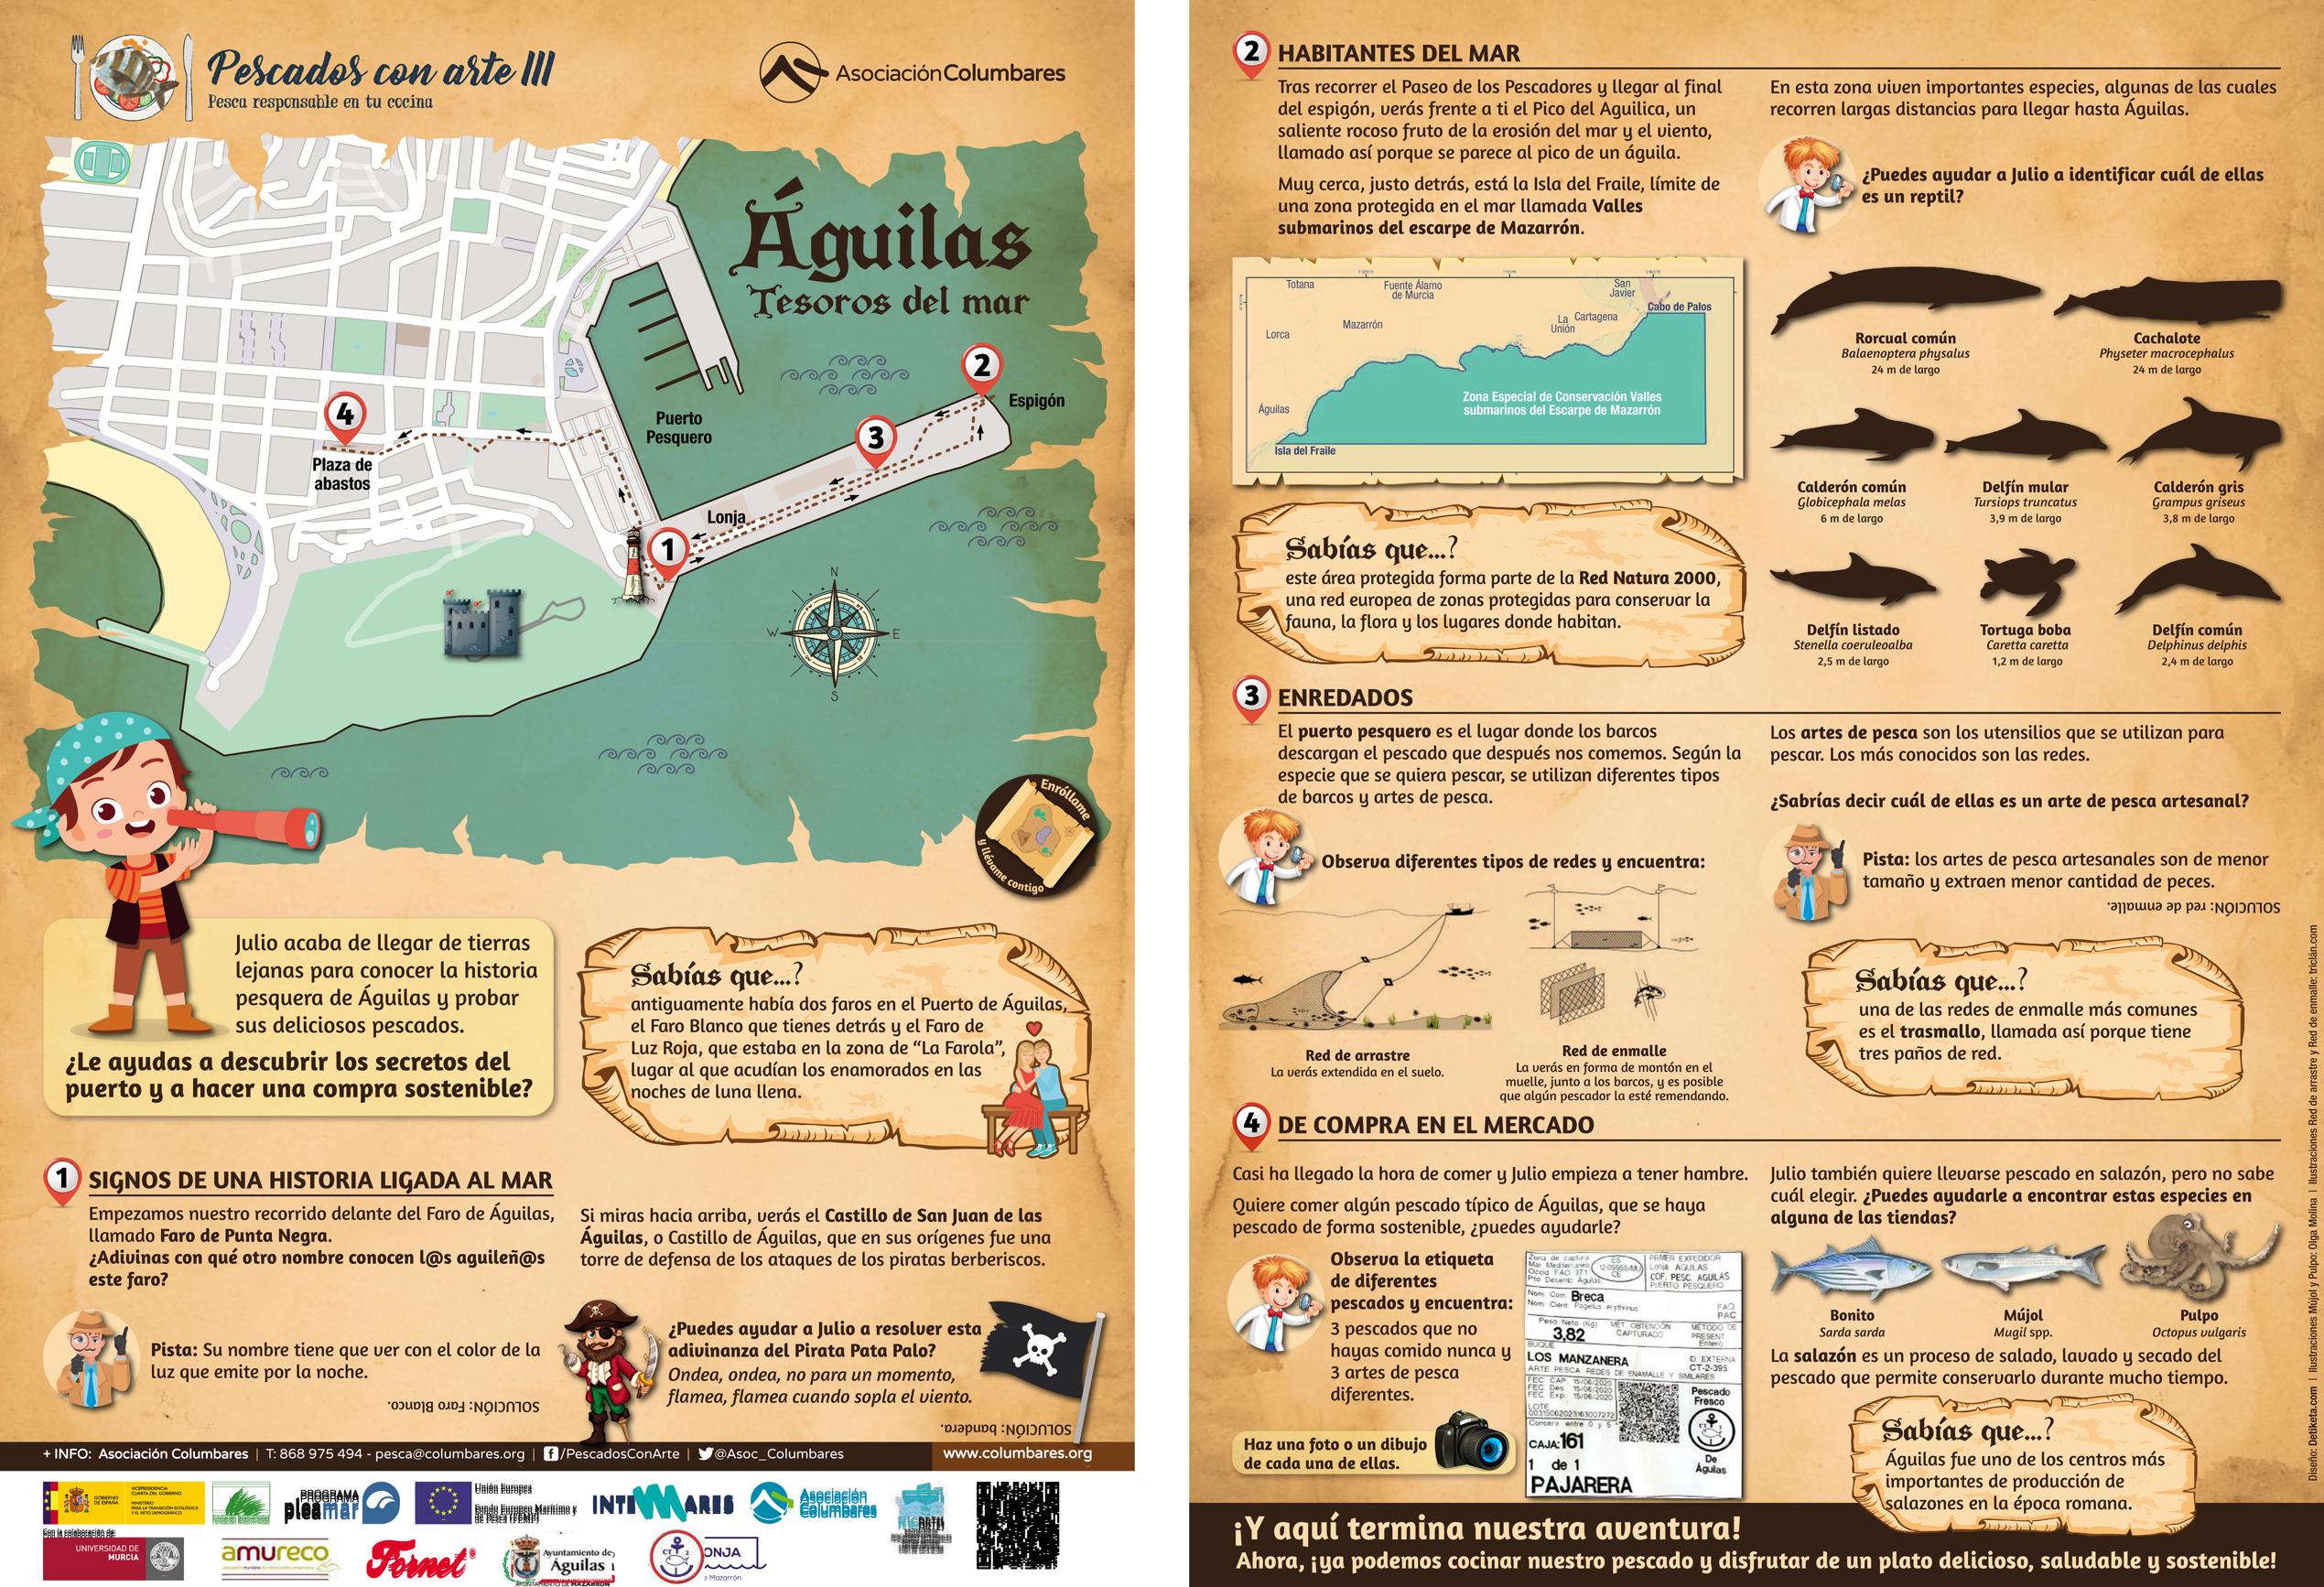 Ruta autoguiada por Águilas, de Pescados con Arte III de la Asociación Columbares